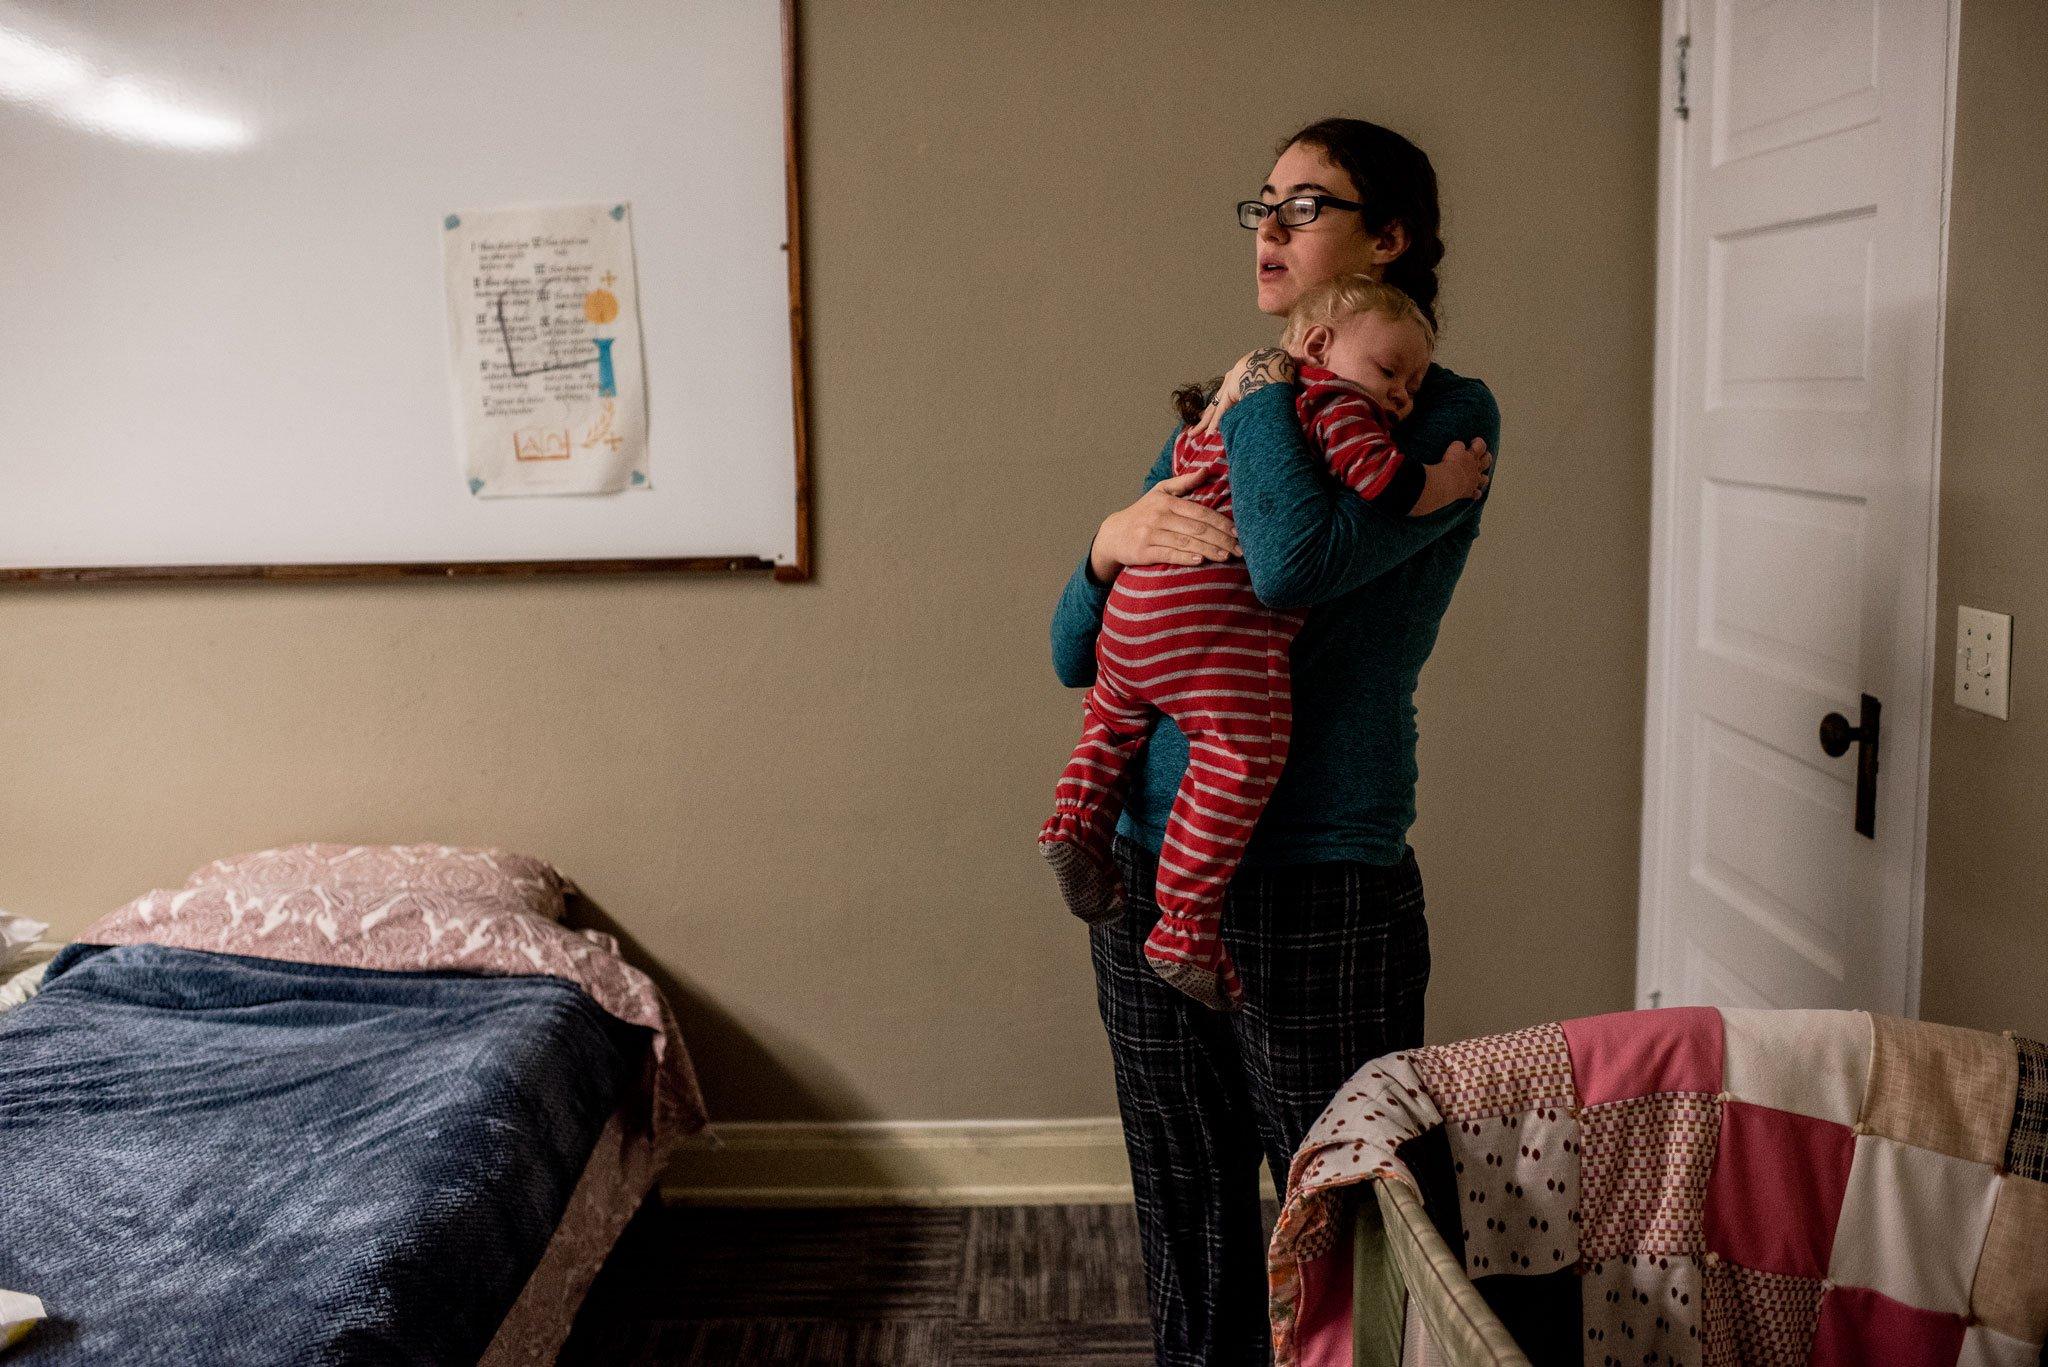 mom holding baby at night